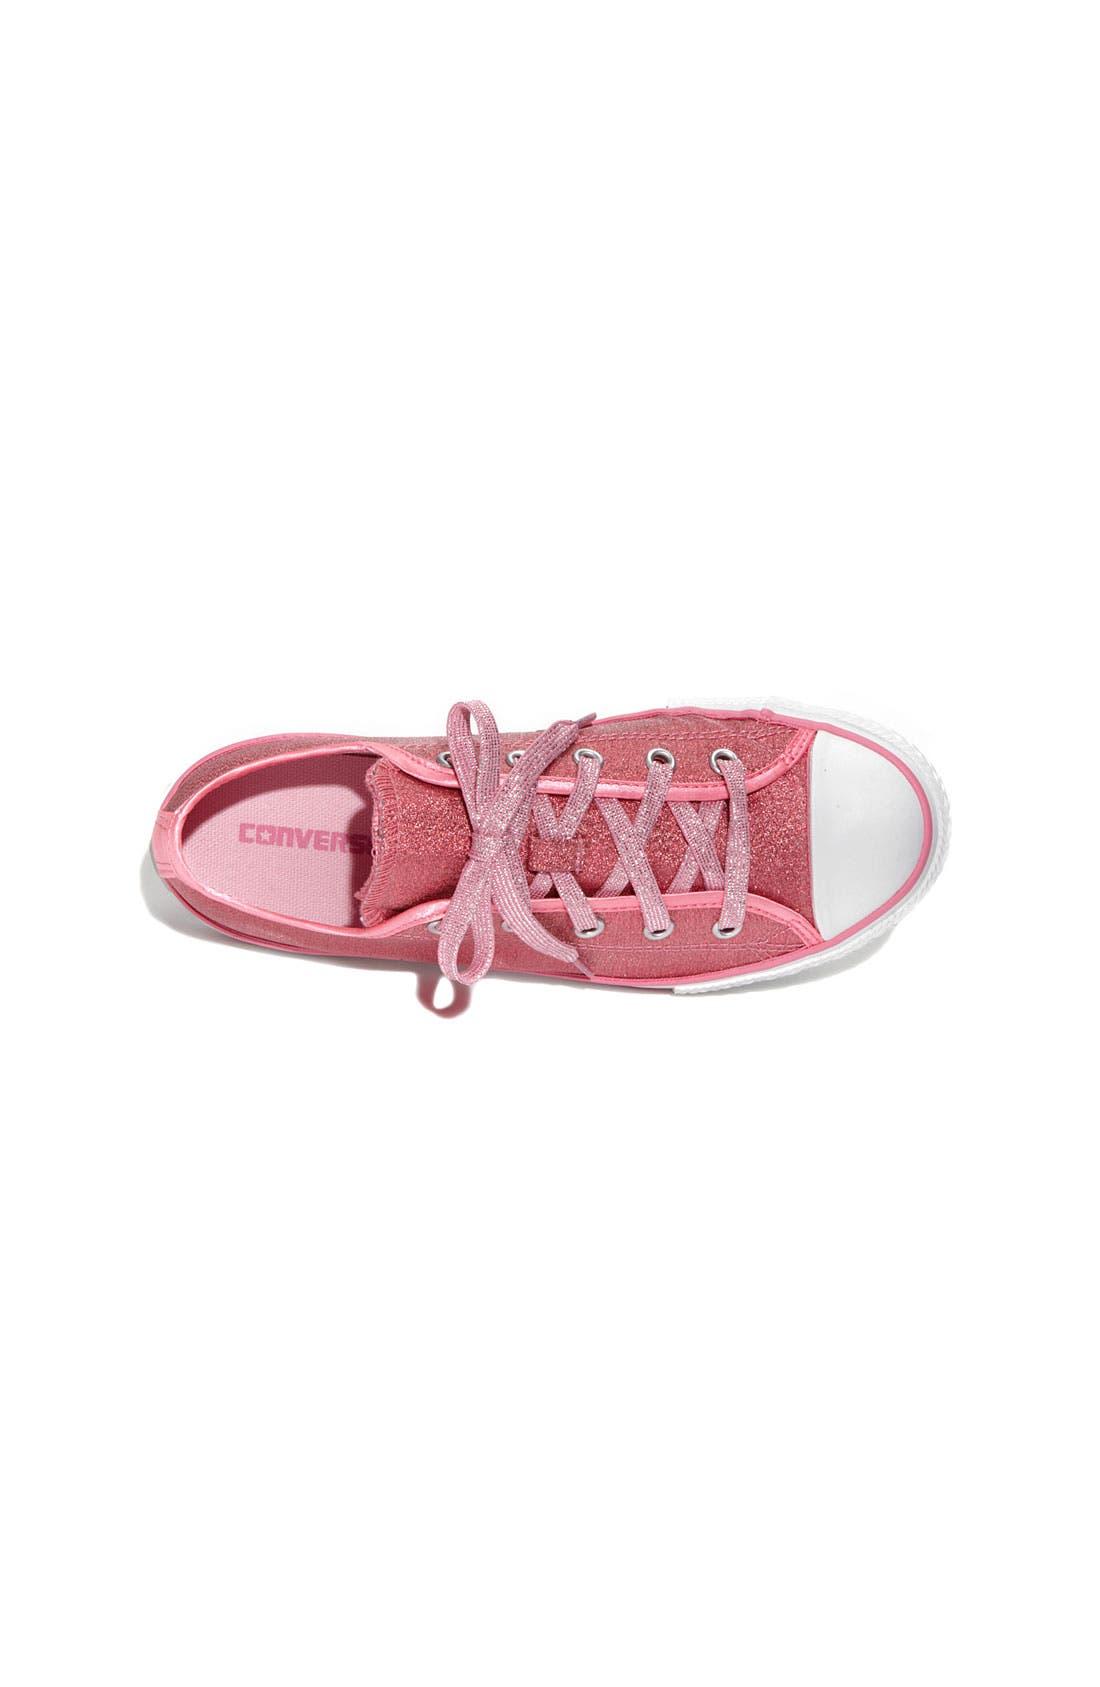 Alternate Image 3  - Converse Double Tongue Sneaker (Toddler, Little Kid & Big Kid)